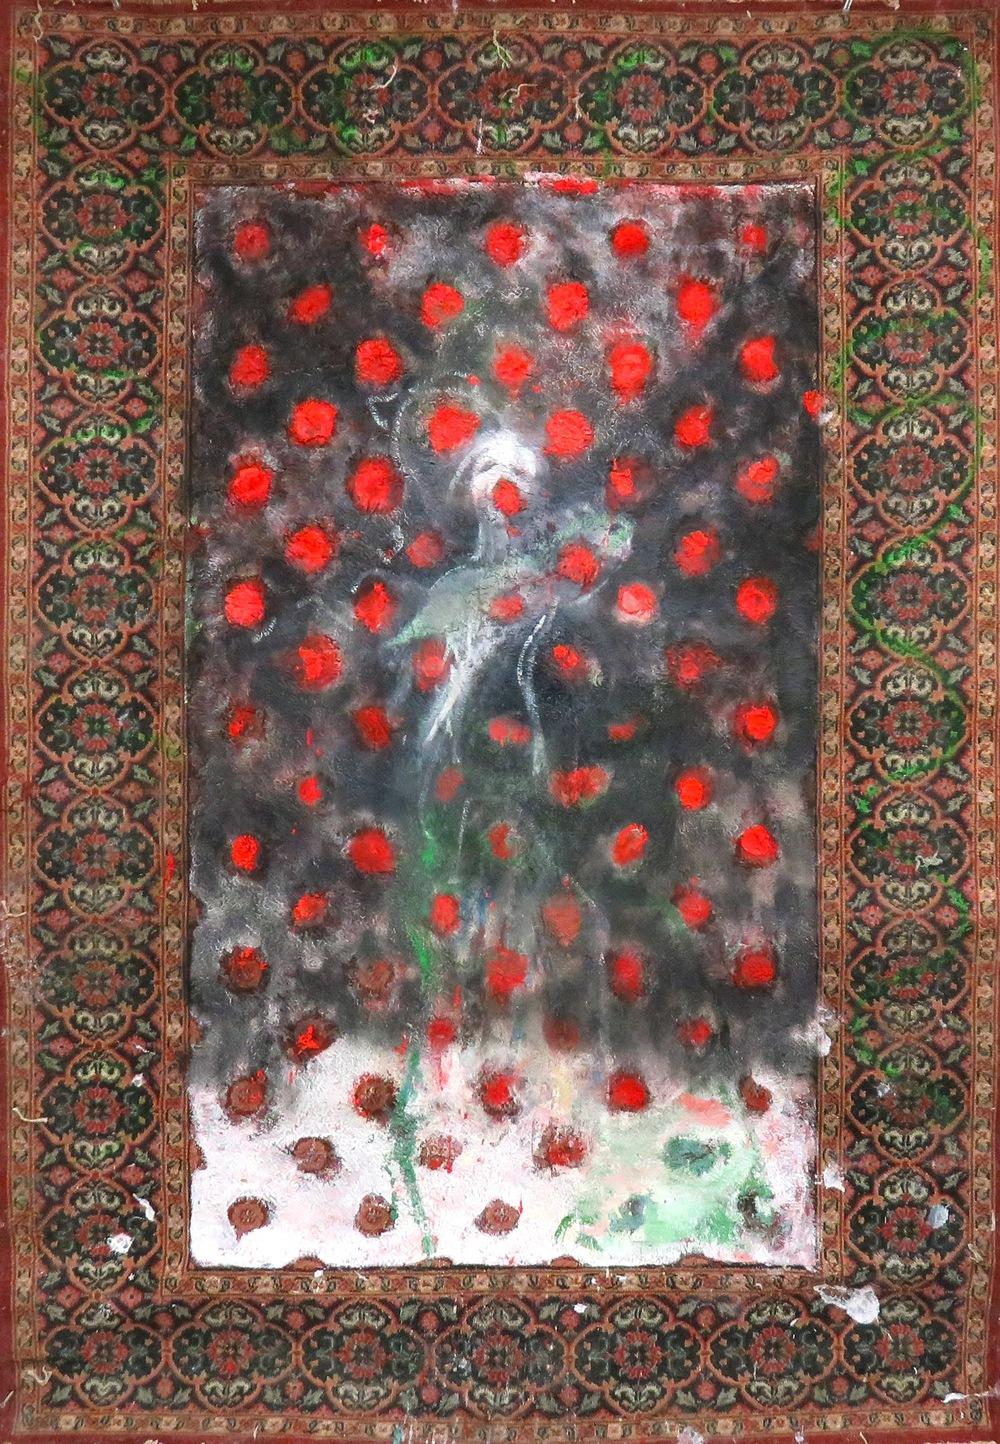 Carpet (a woman is not a savior)